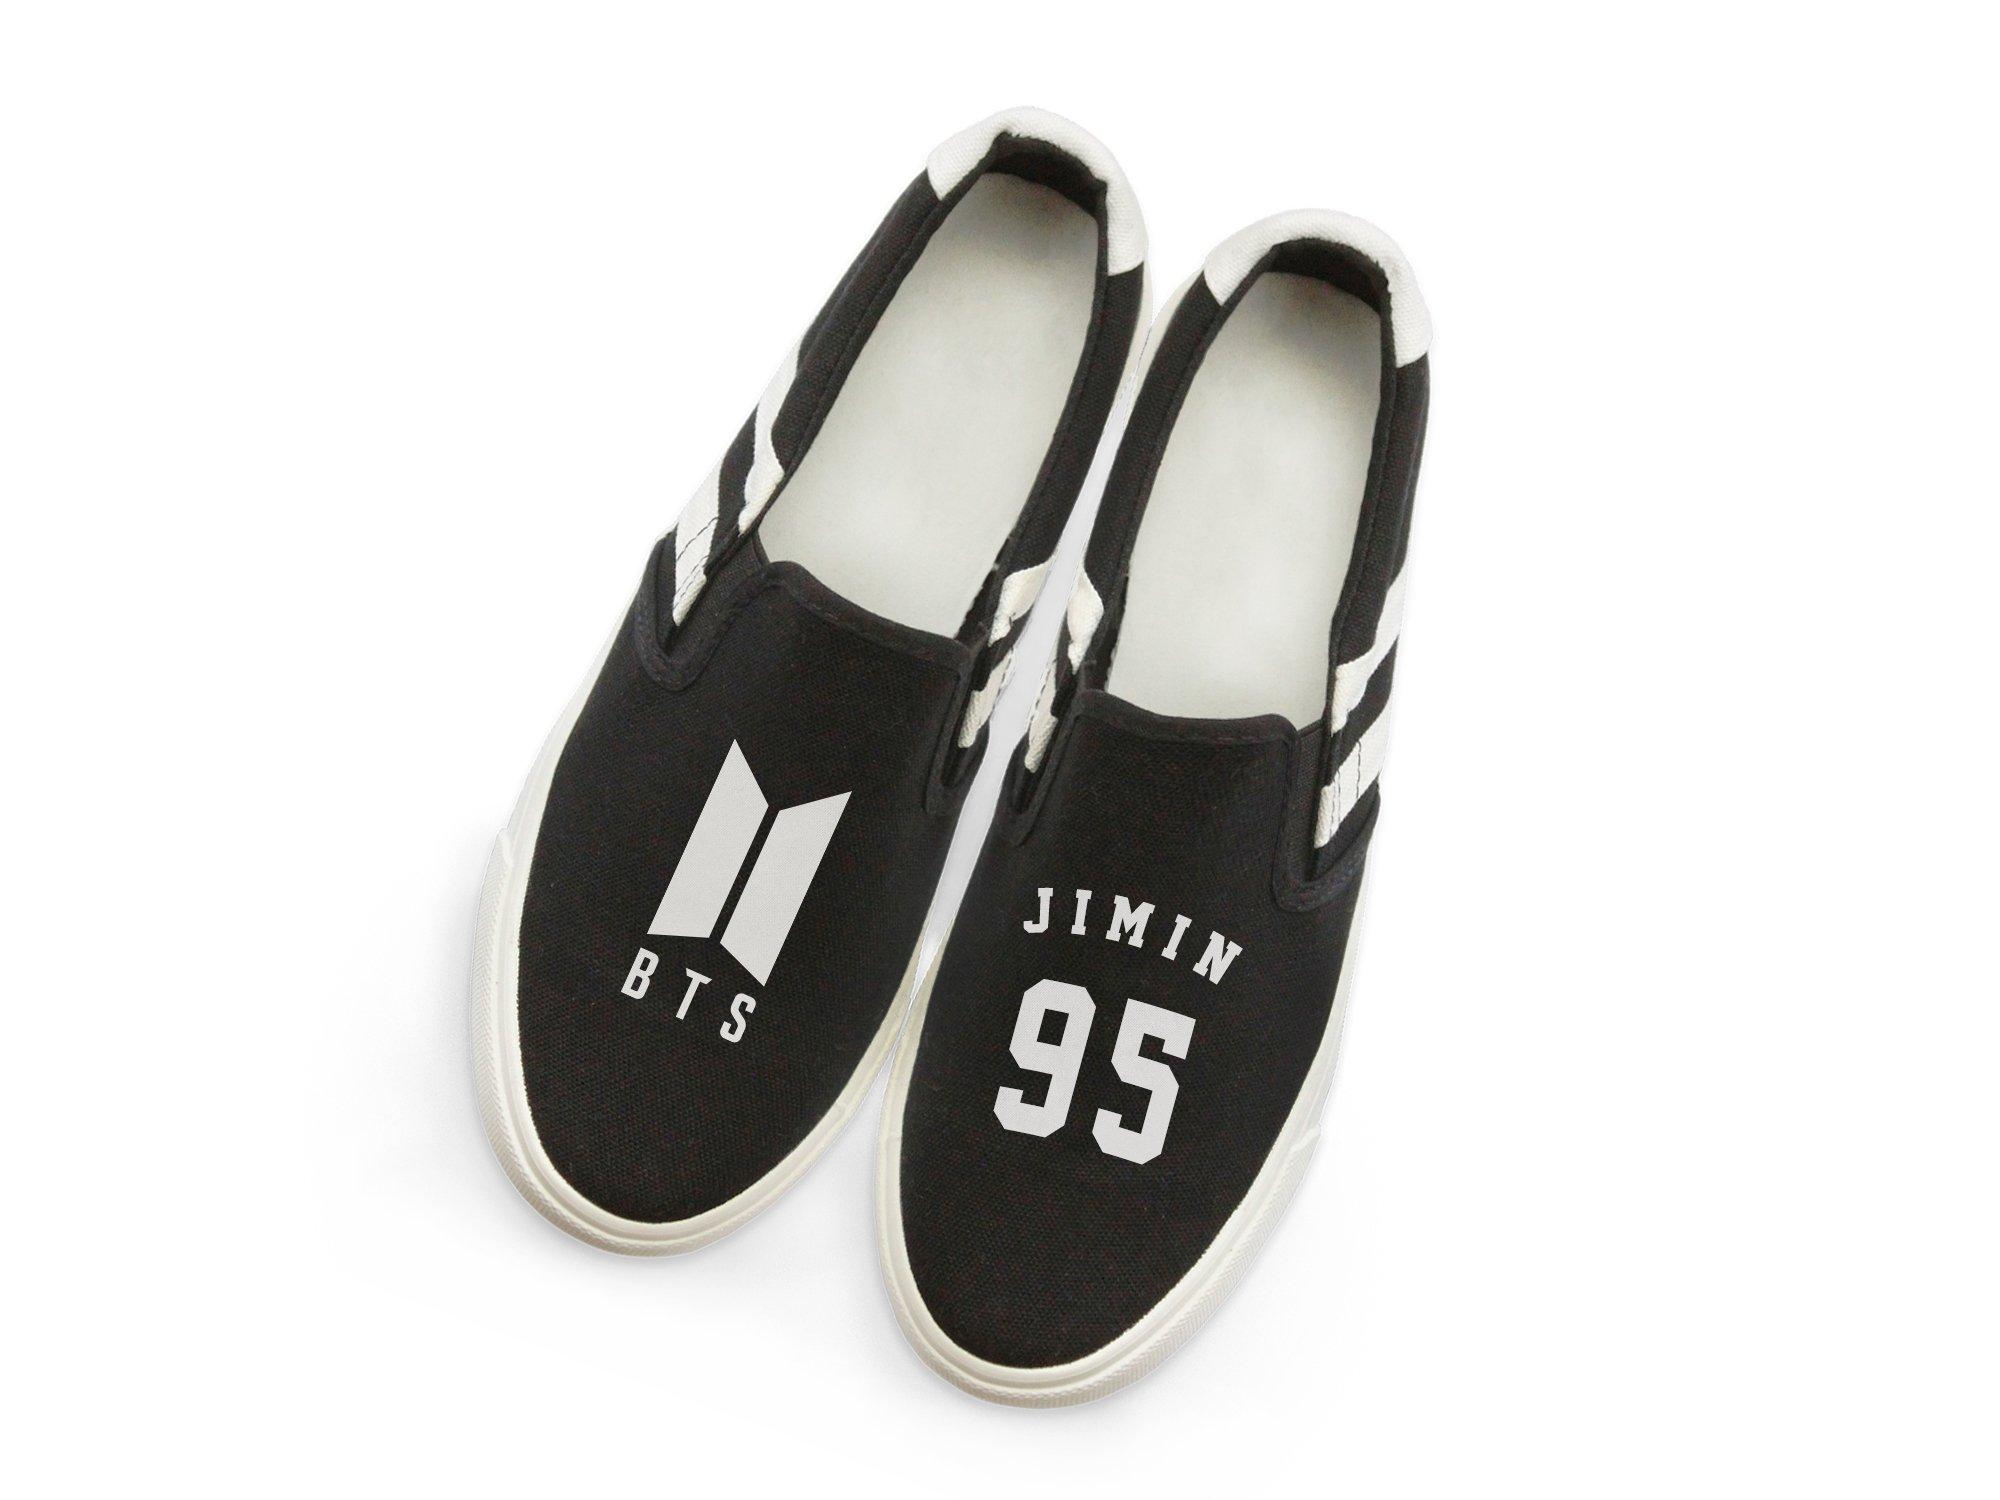 Fanstown BTS Kpop Sneakers Shoes Fanshion Memeber Hiphop Style Fan Support V Suga Junkkook with lomo Card (5.5, Jimin B)